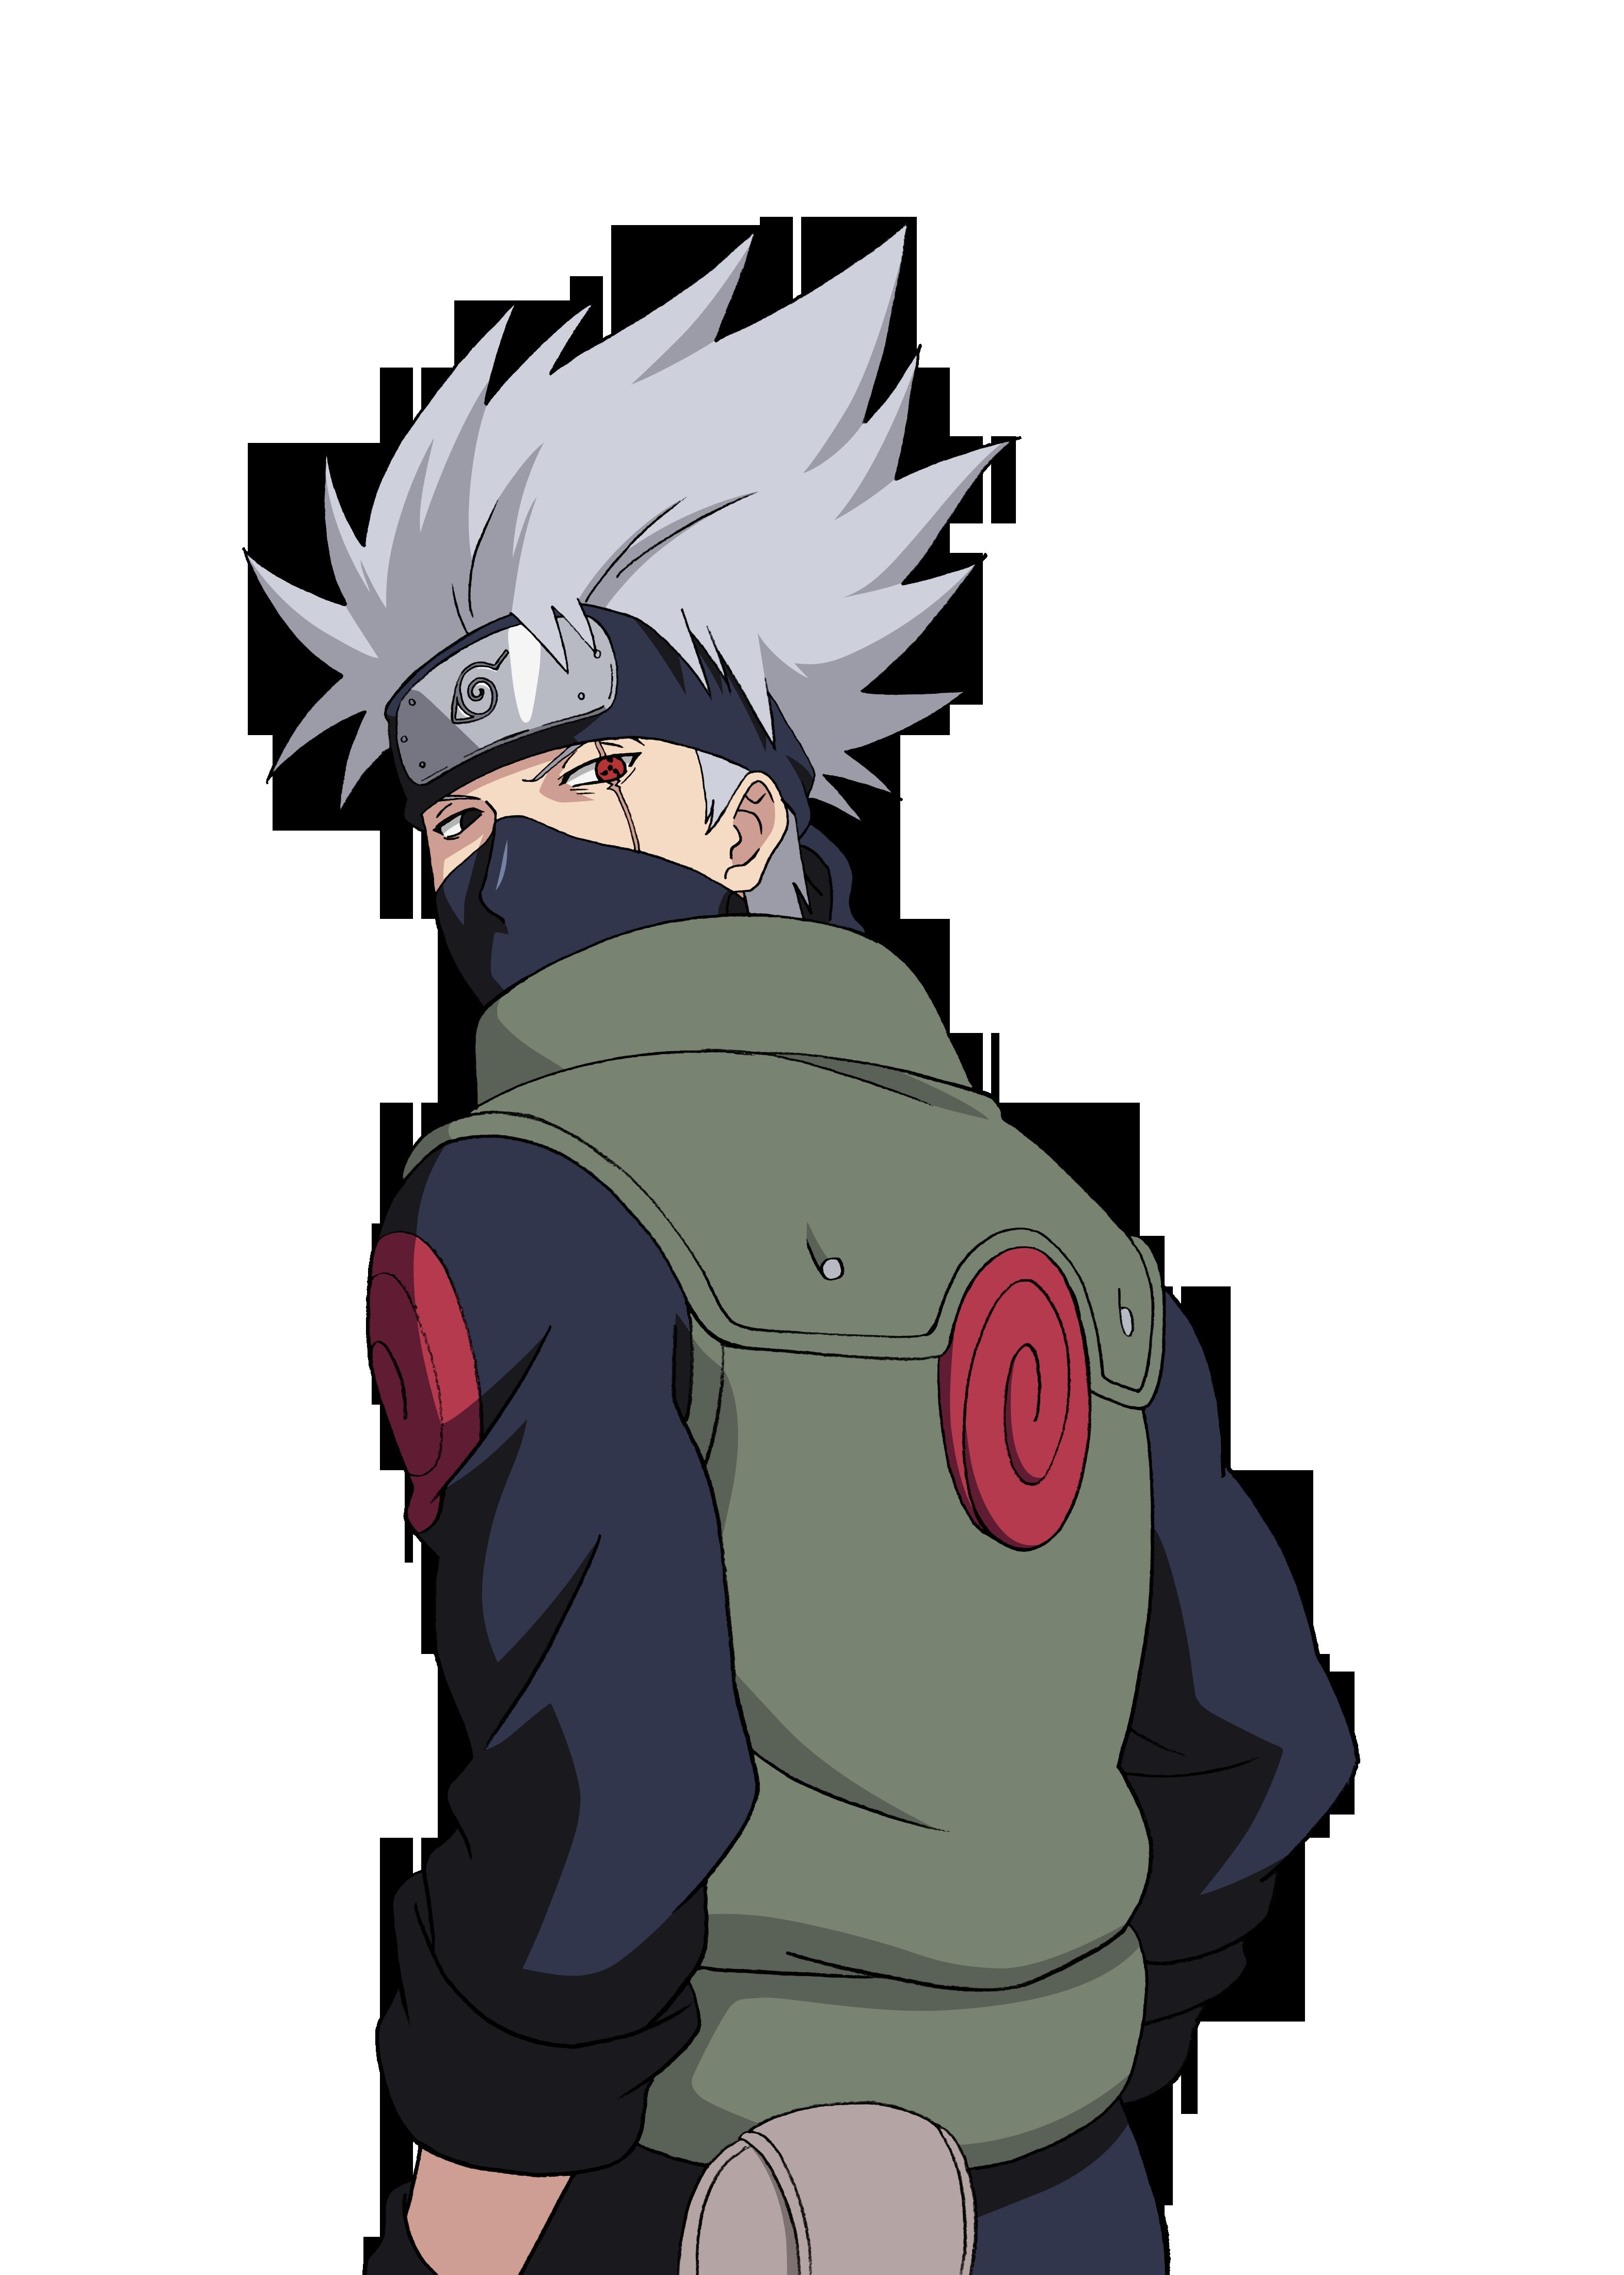 Photo of Kakashi render artwork [Clash of Ninja R. 2] by Maxiuchiha22 on DeviantArt